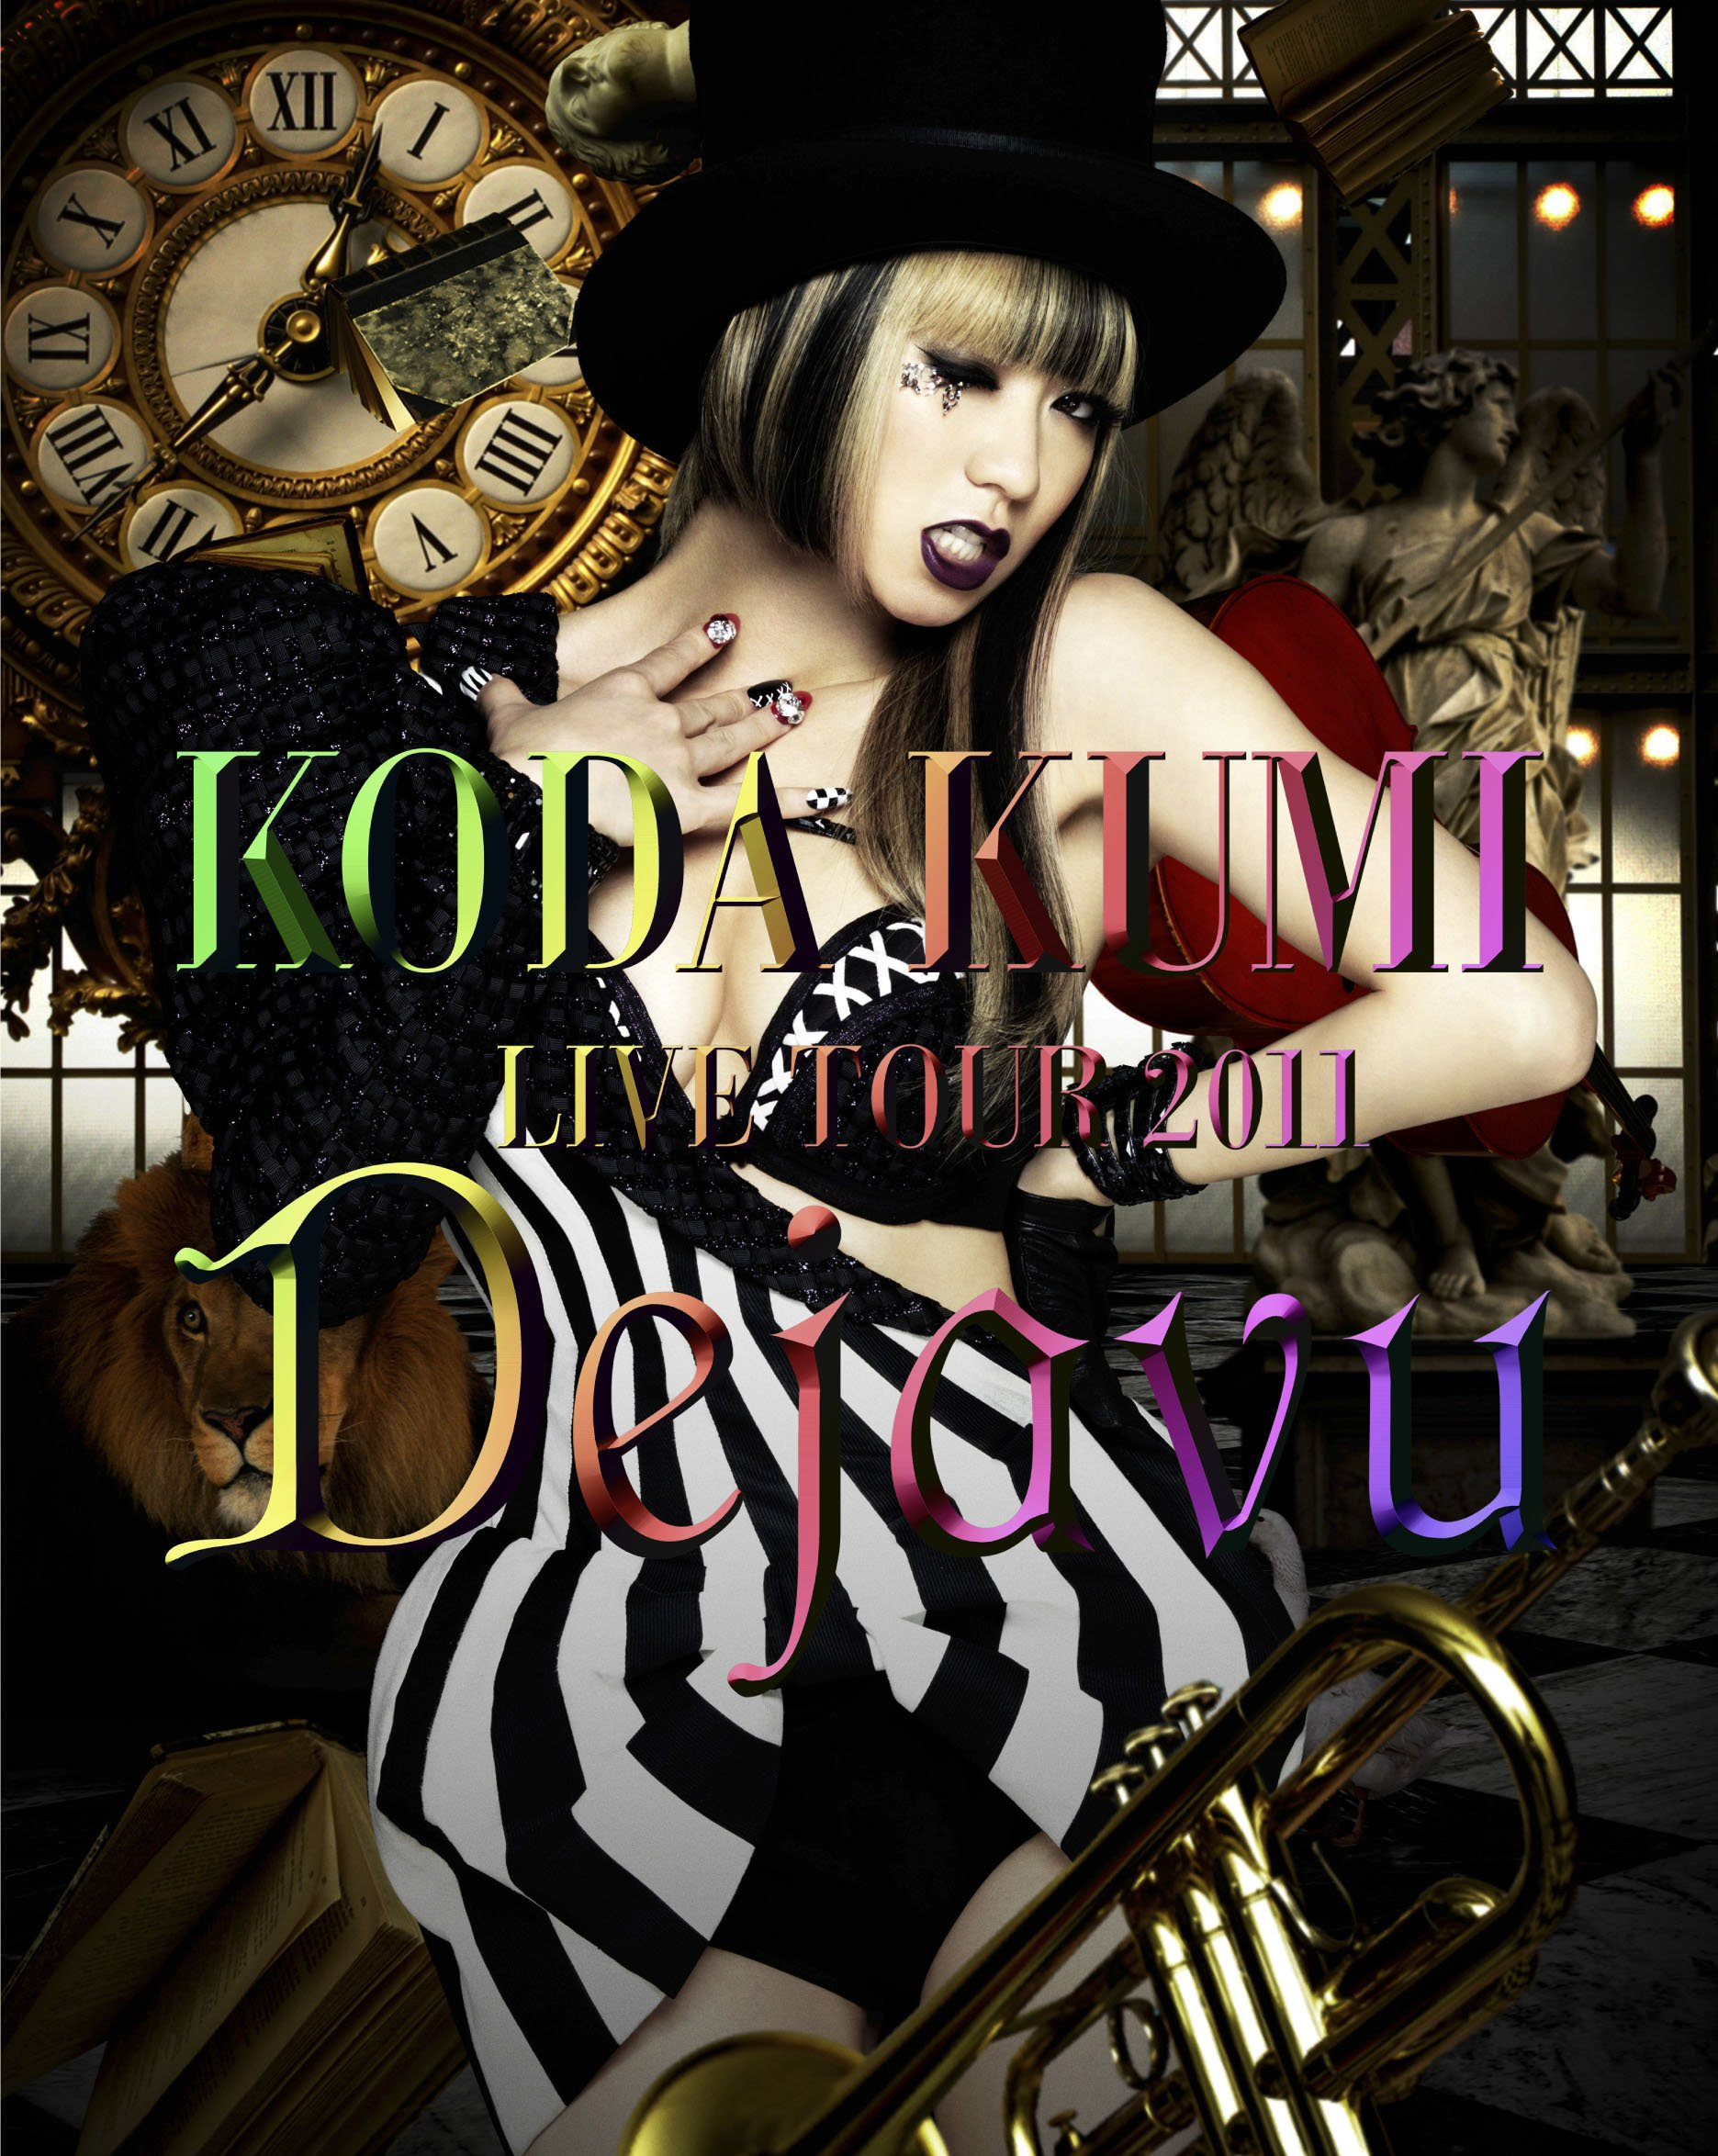 倖田來未 (Koda Kumi) – KODA KUMI LIVE TOUR 2011 ~Dejavu~ [Blu-ray ISO + MKV 1080p] [2012.02.08]